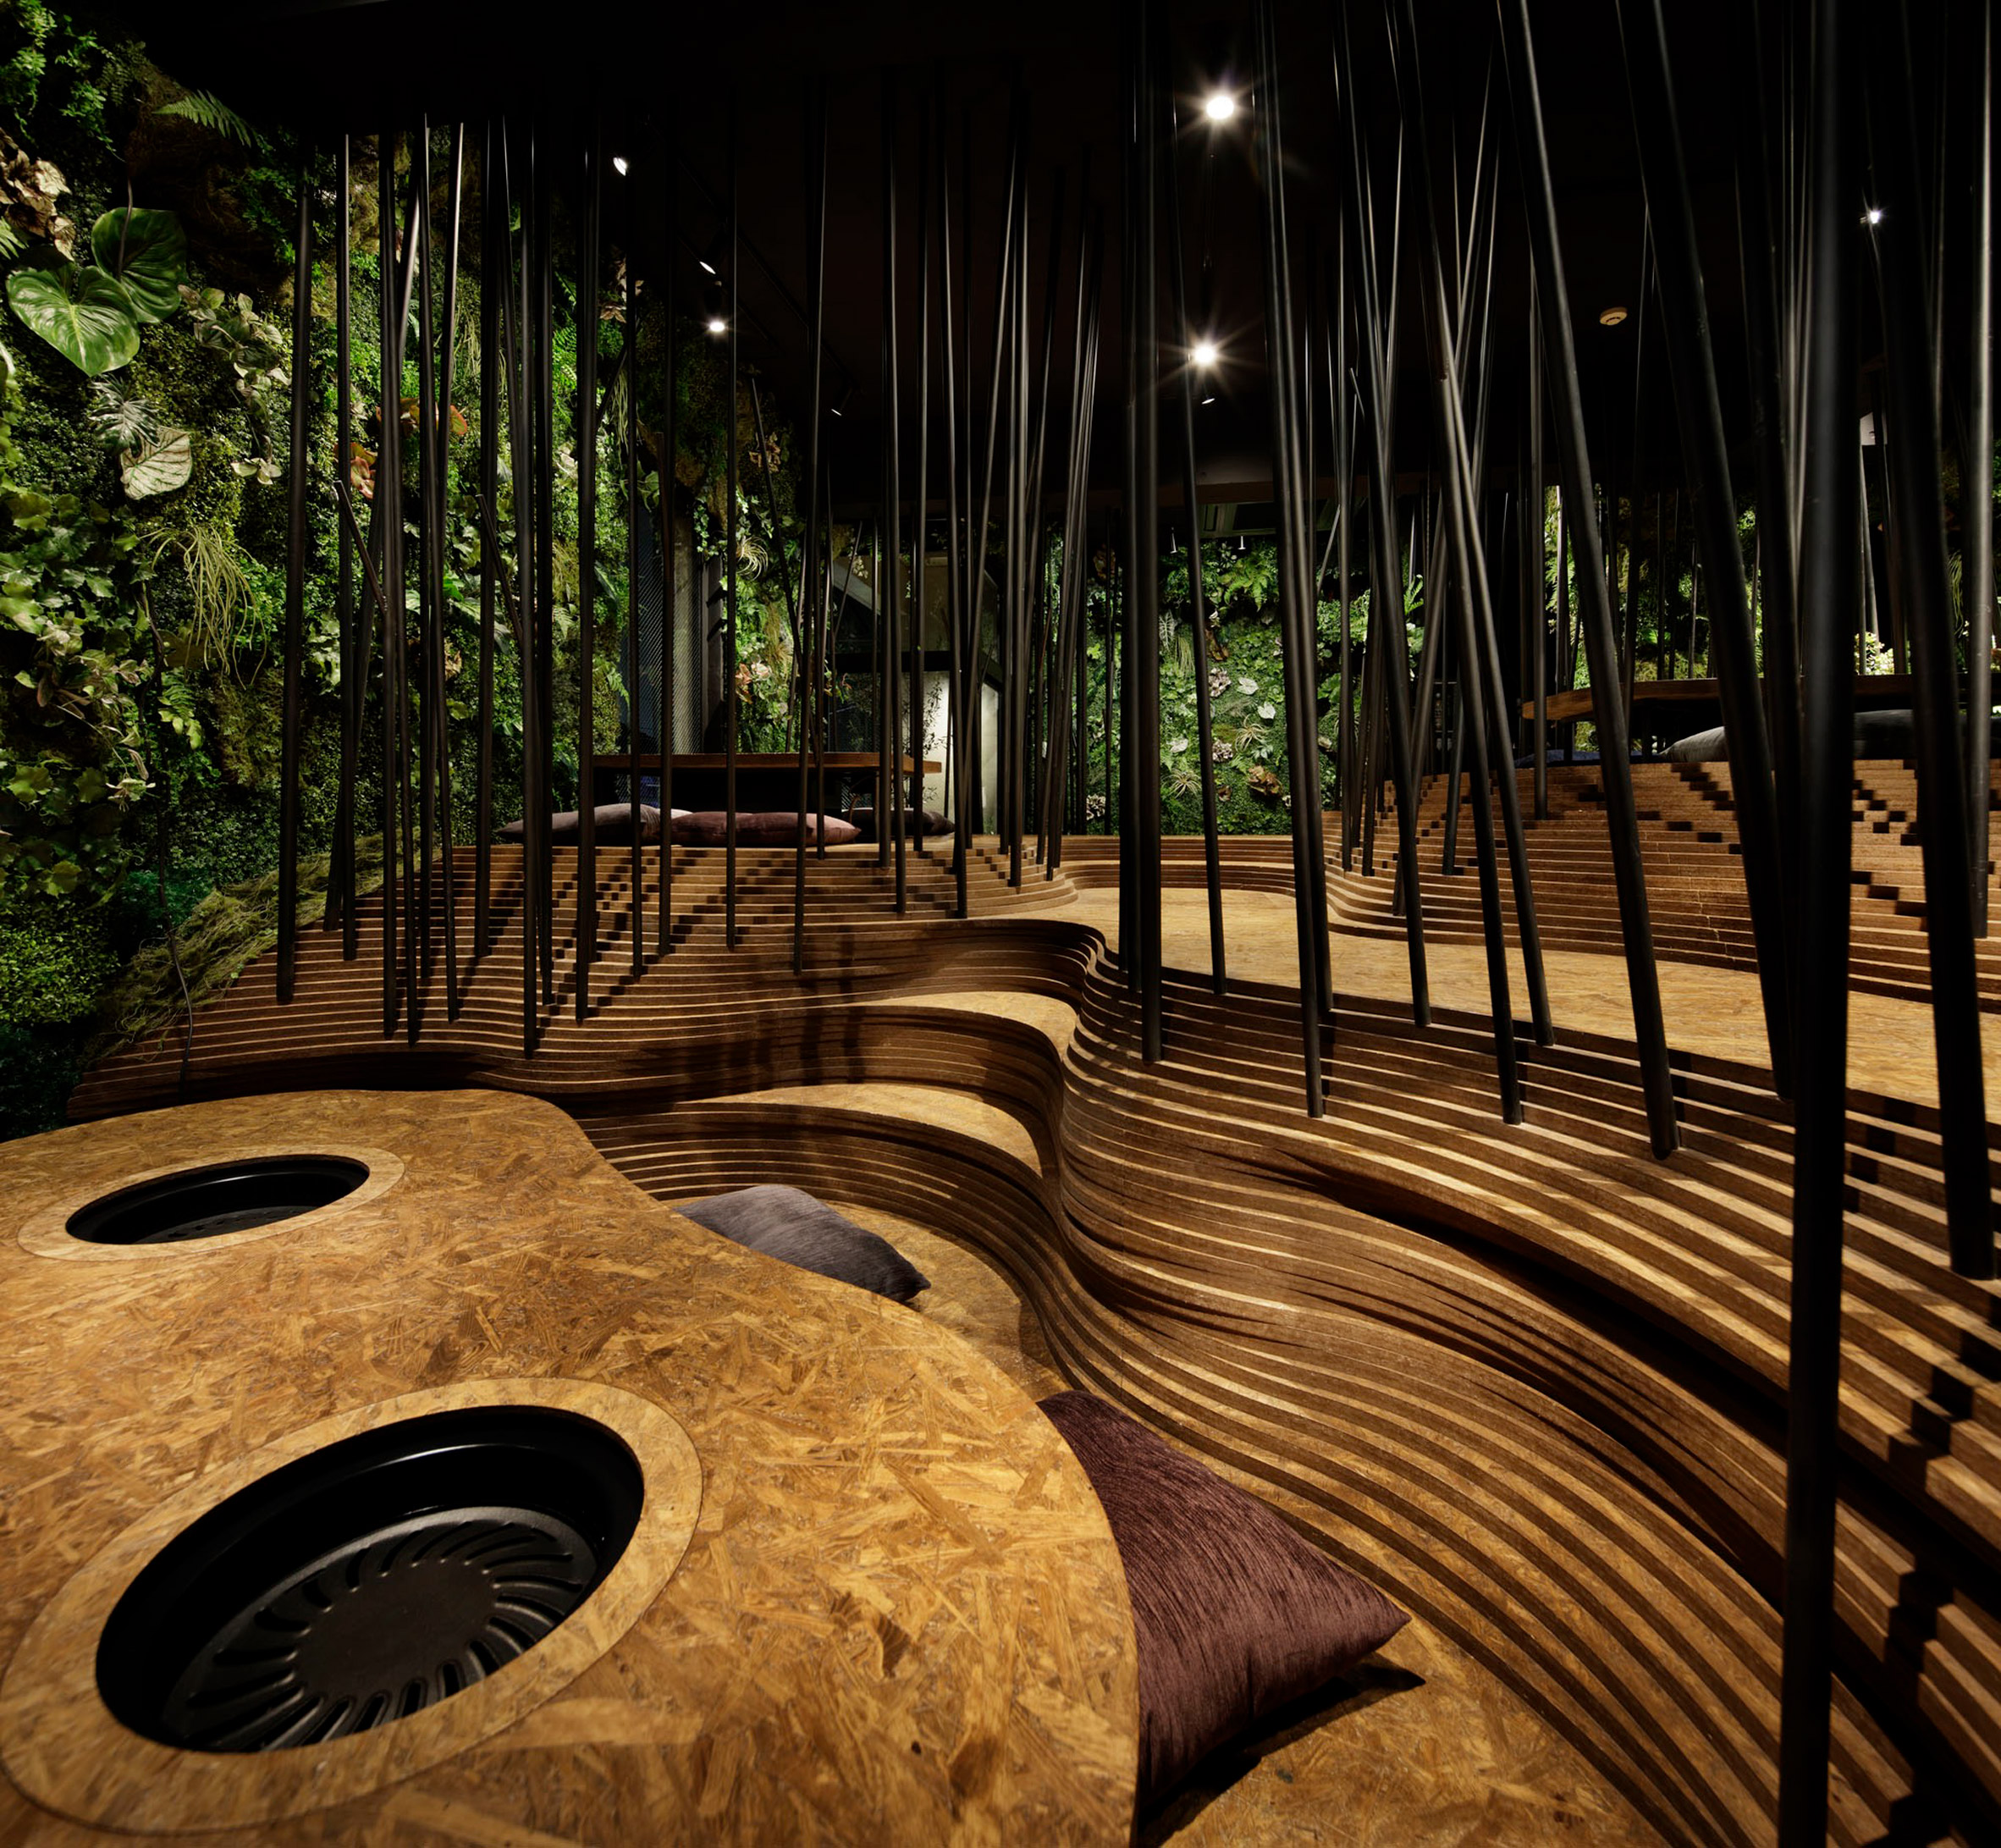 nikunotoriko-restaurant-interiors-tokyo-ryoji-Iedokoro-japan_dezeen_2364_col_14